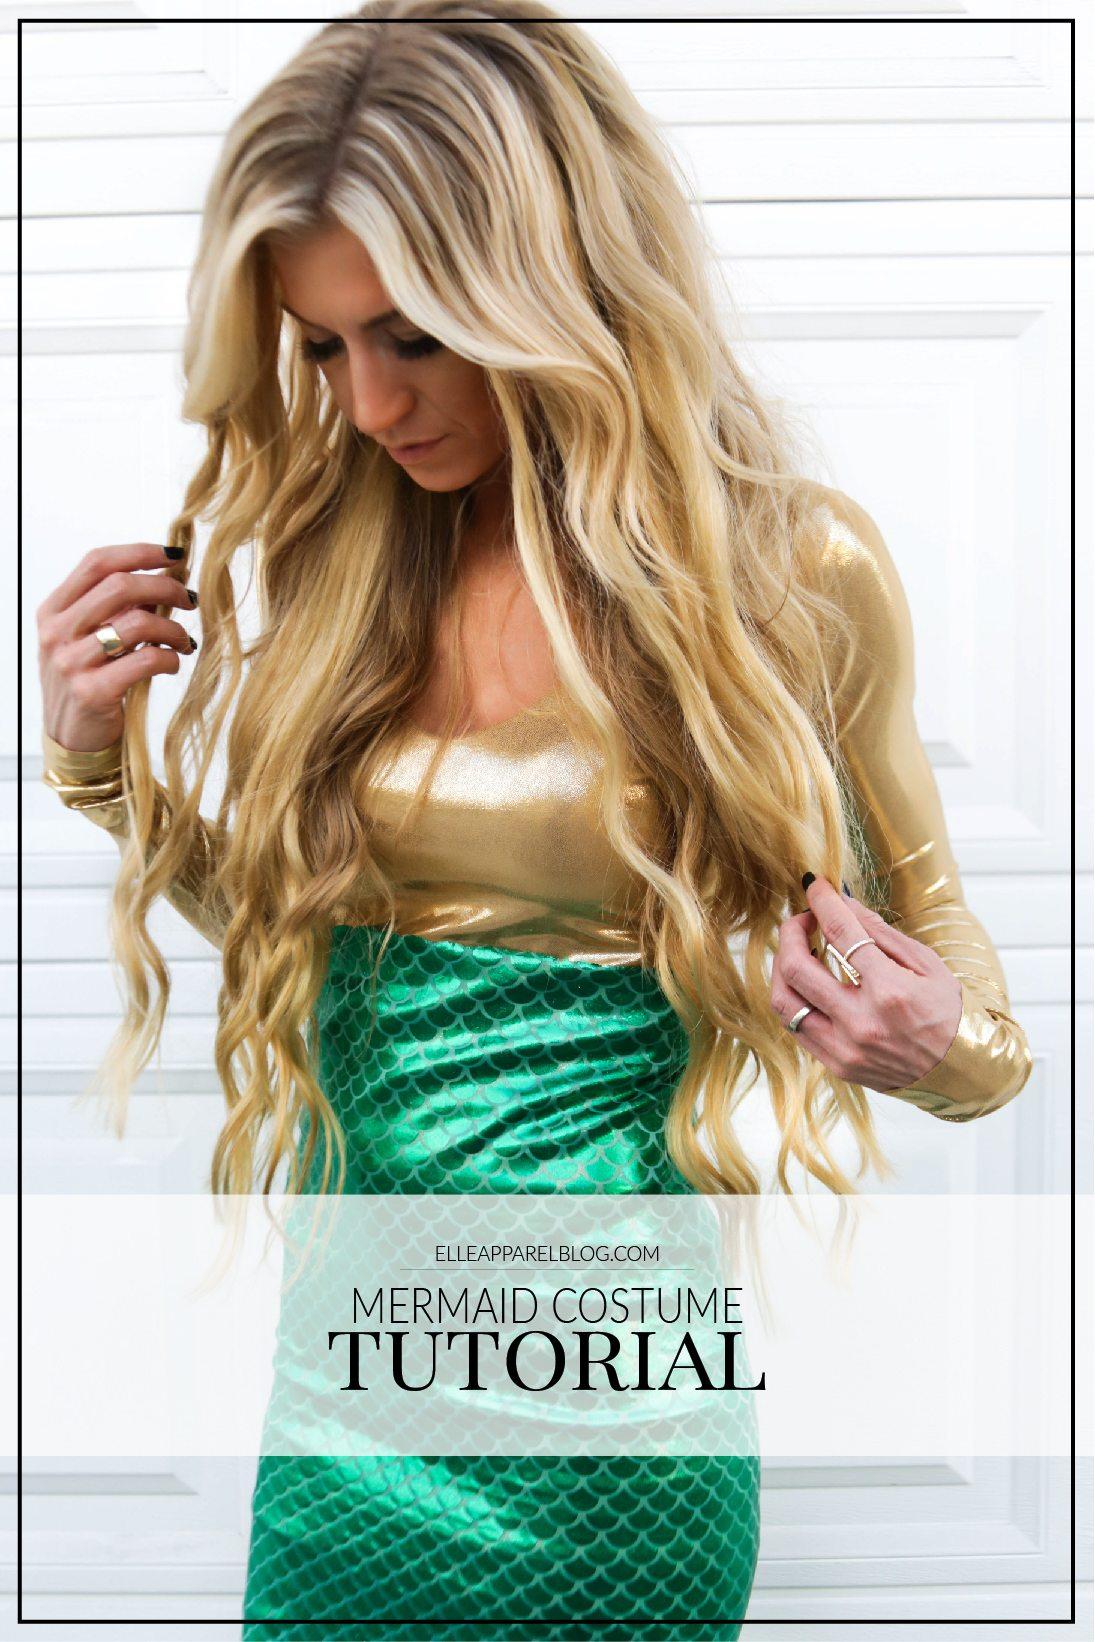 Golden mermaid costume tutorial.